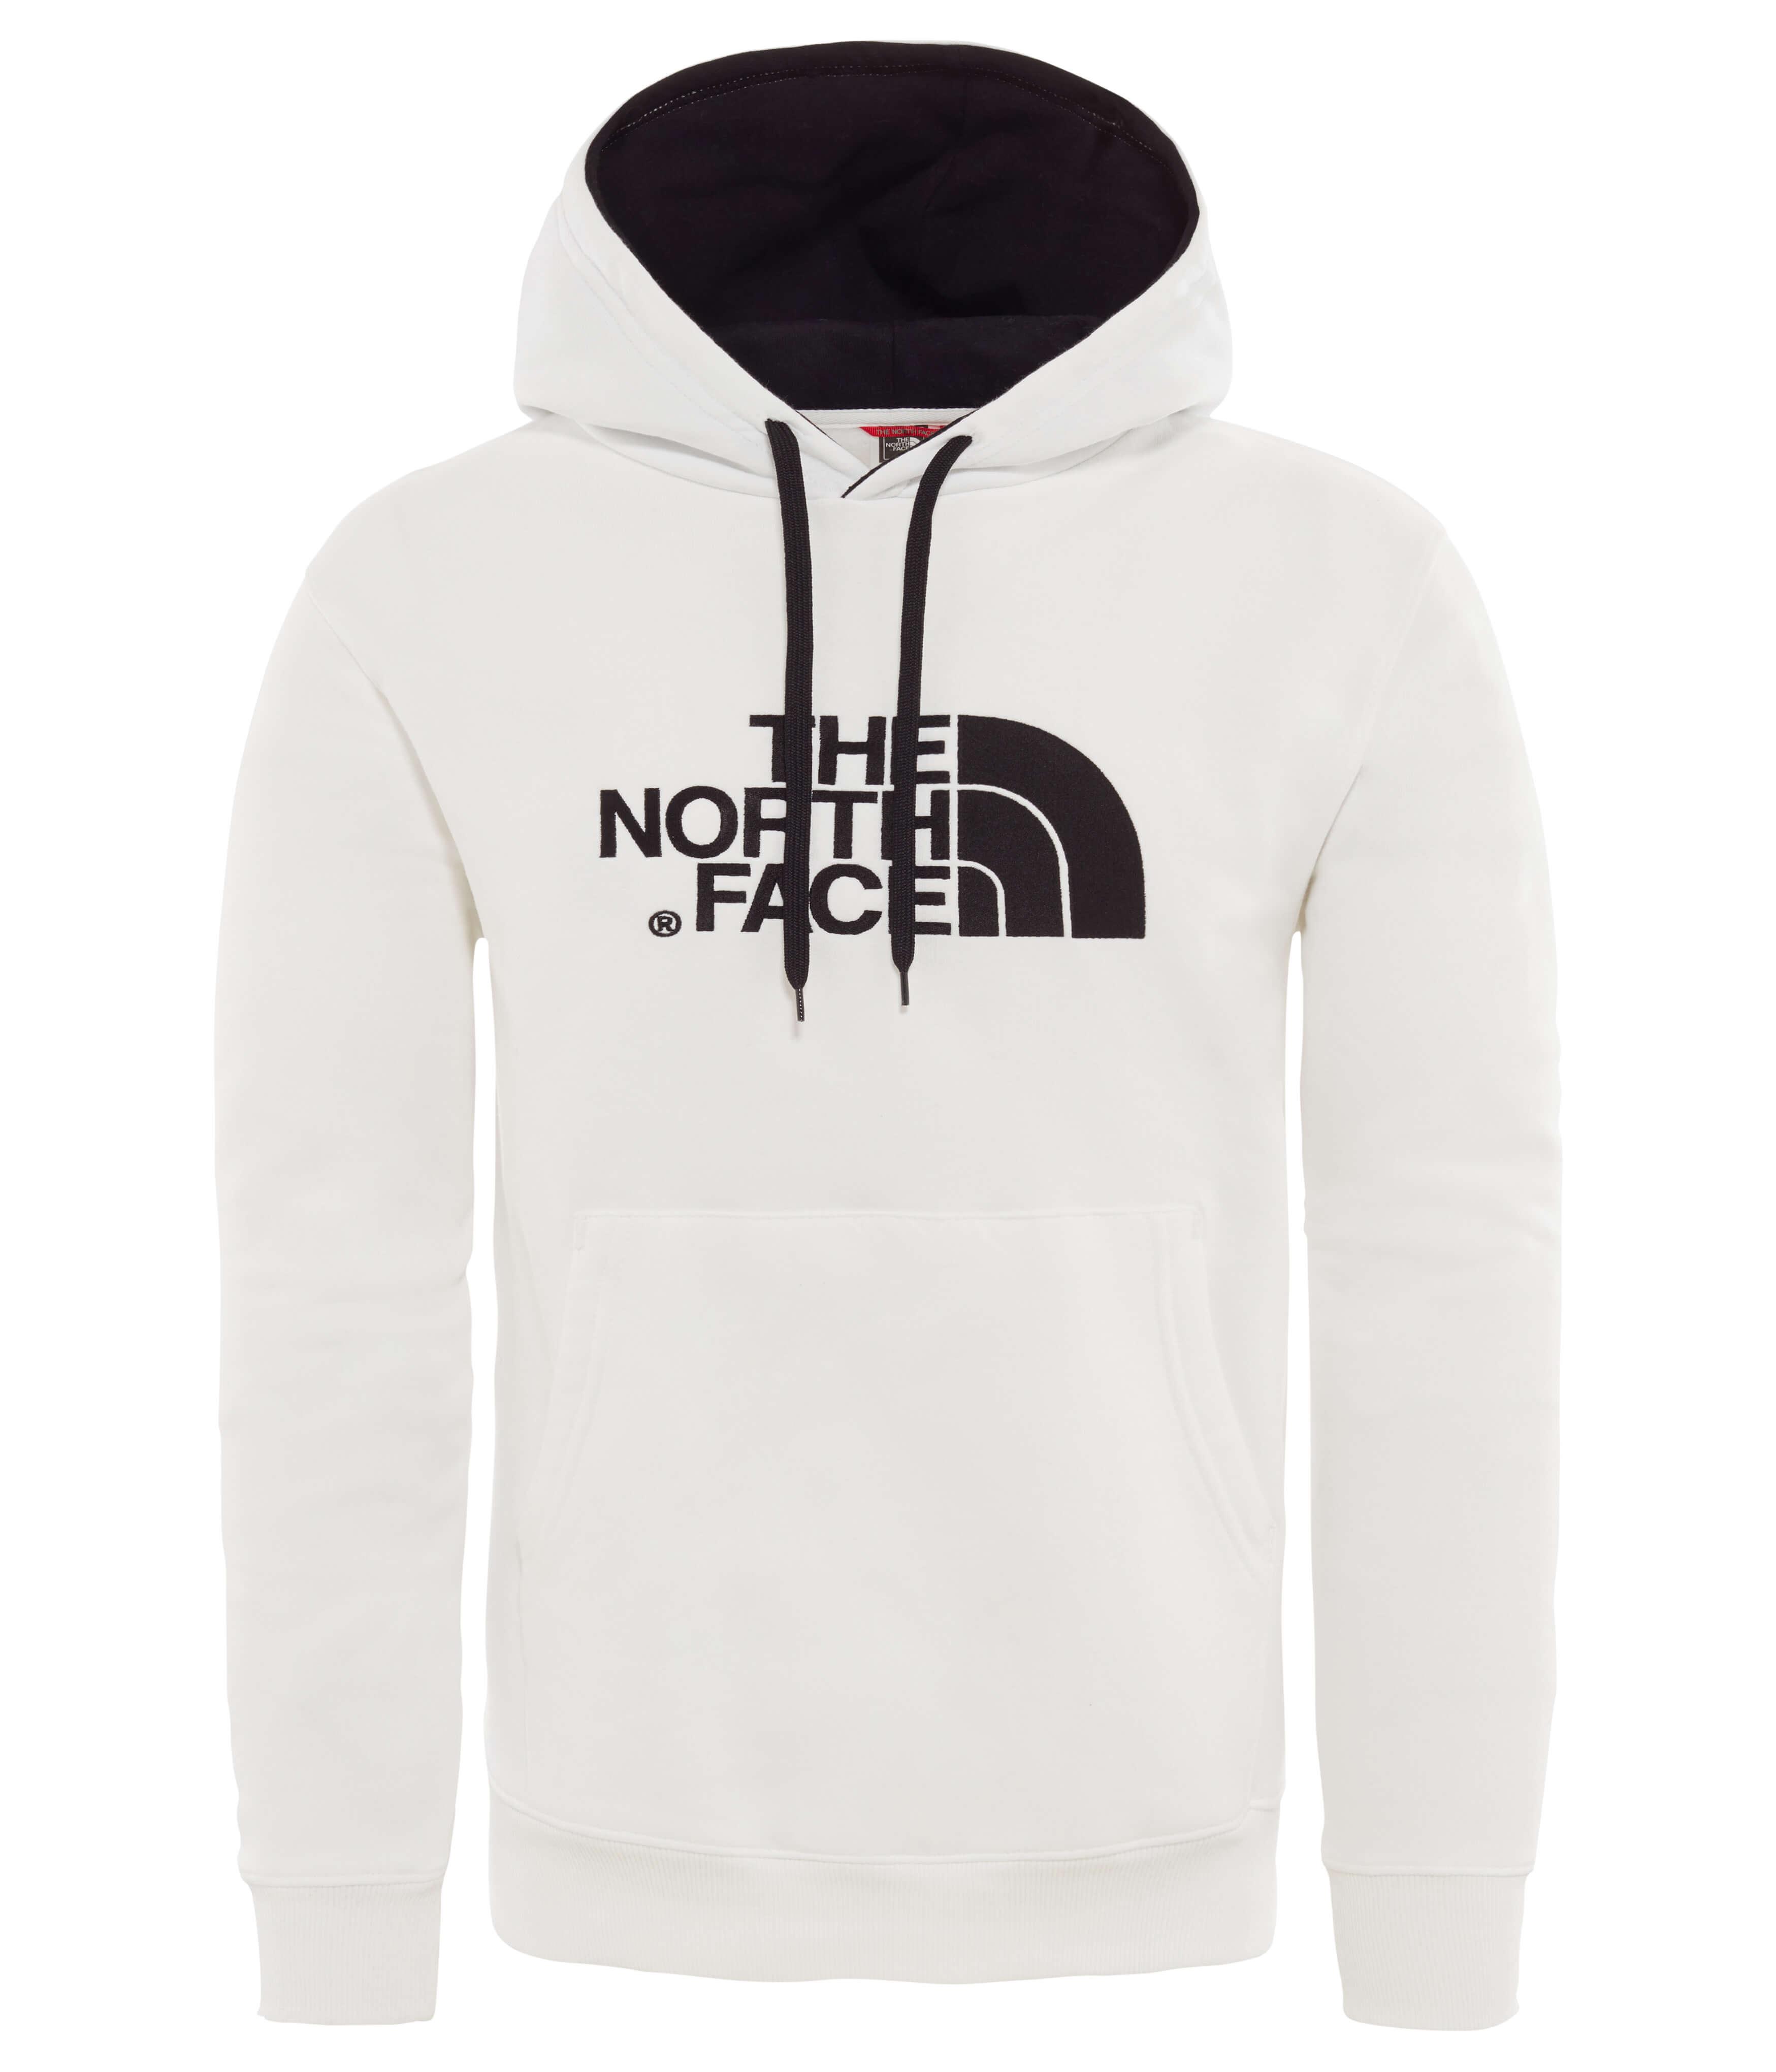 North Face Miesten Huppari, Drew Peak P HOODIE Valkoinen